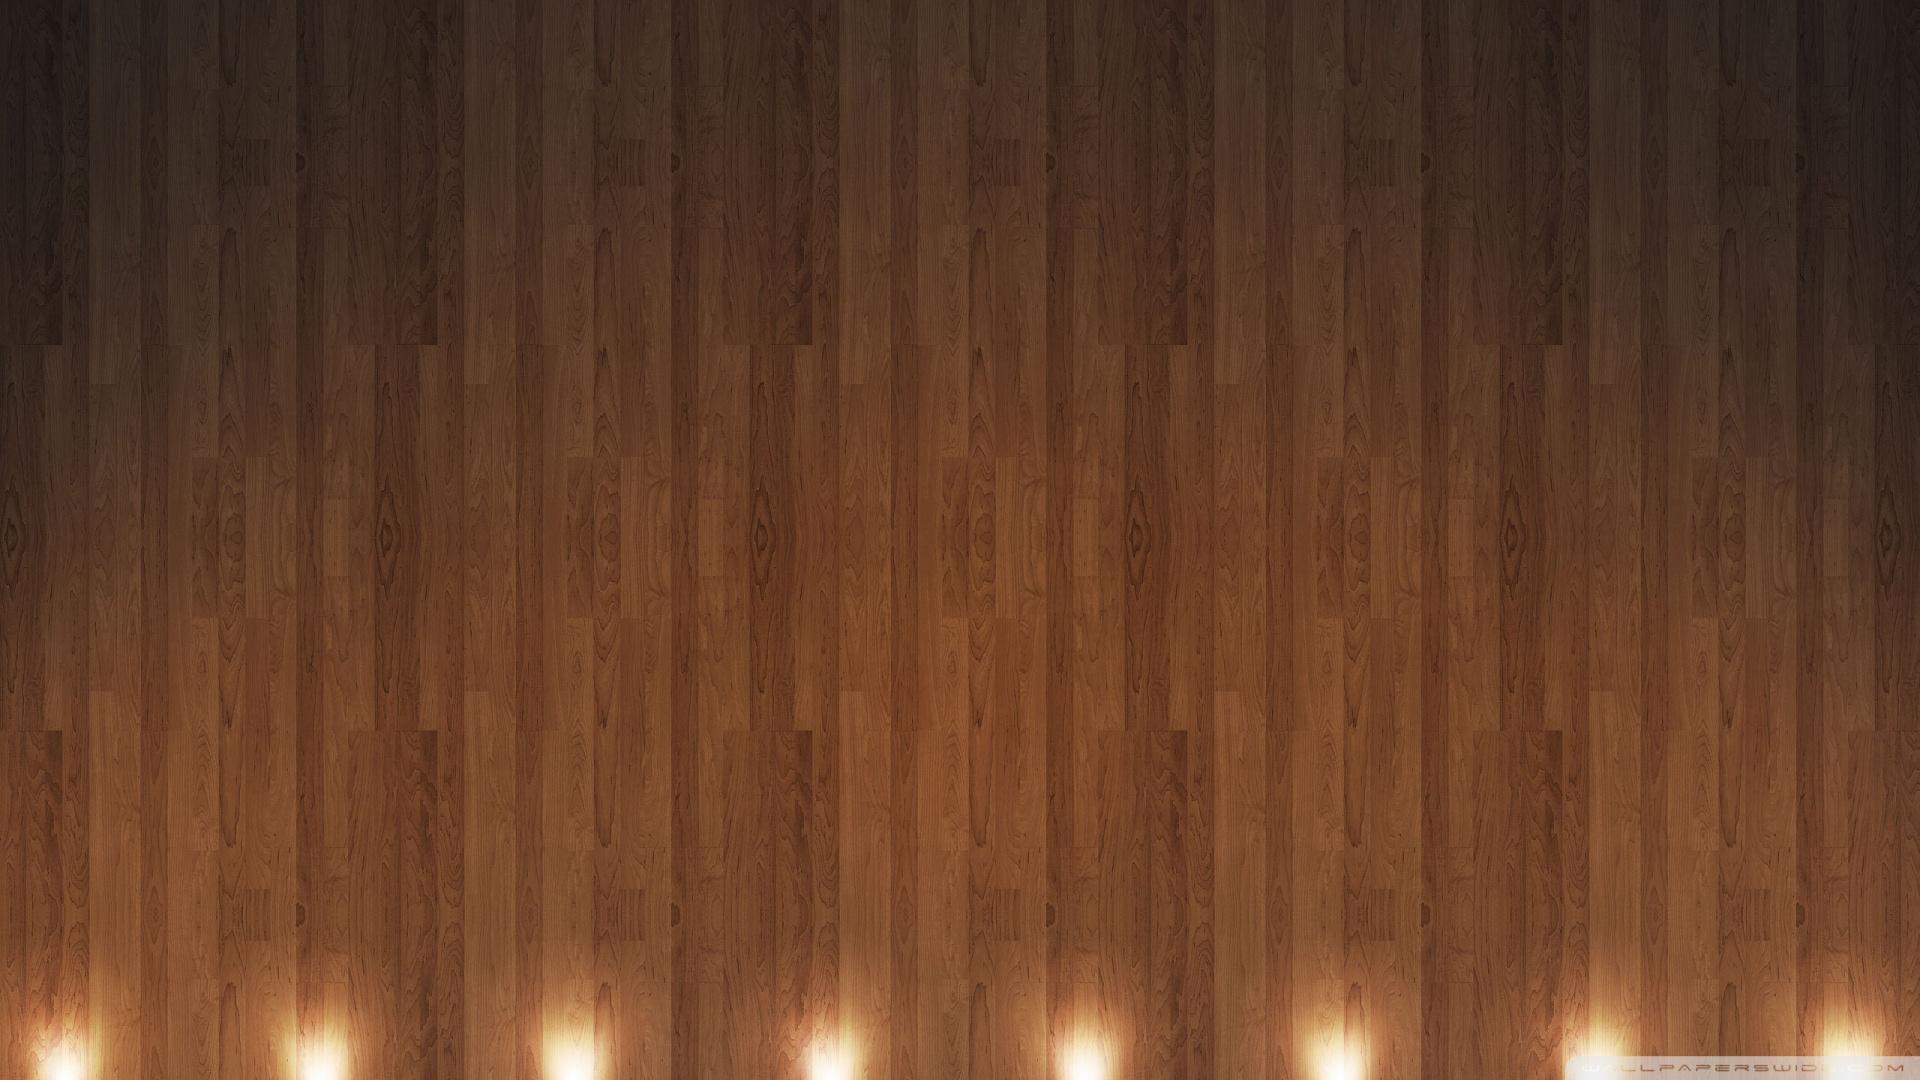 Free Download Wallpaper That Looks Like Wood Hd 1920x1080